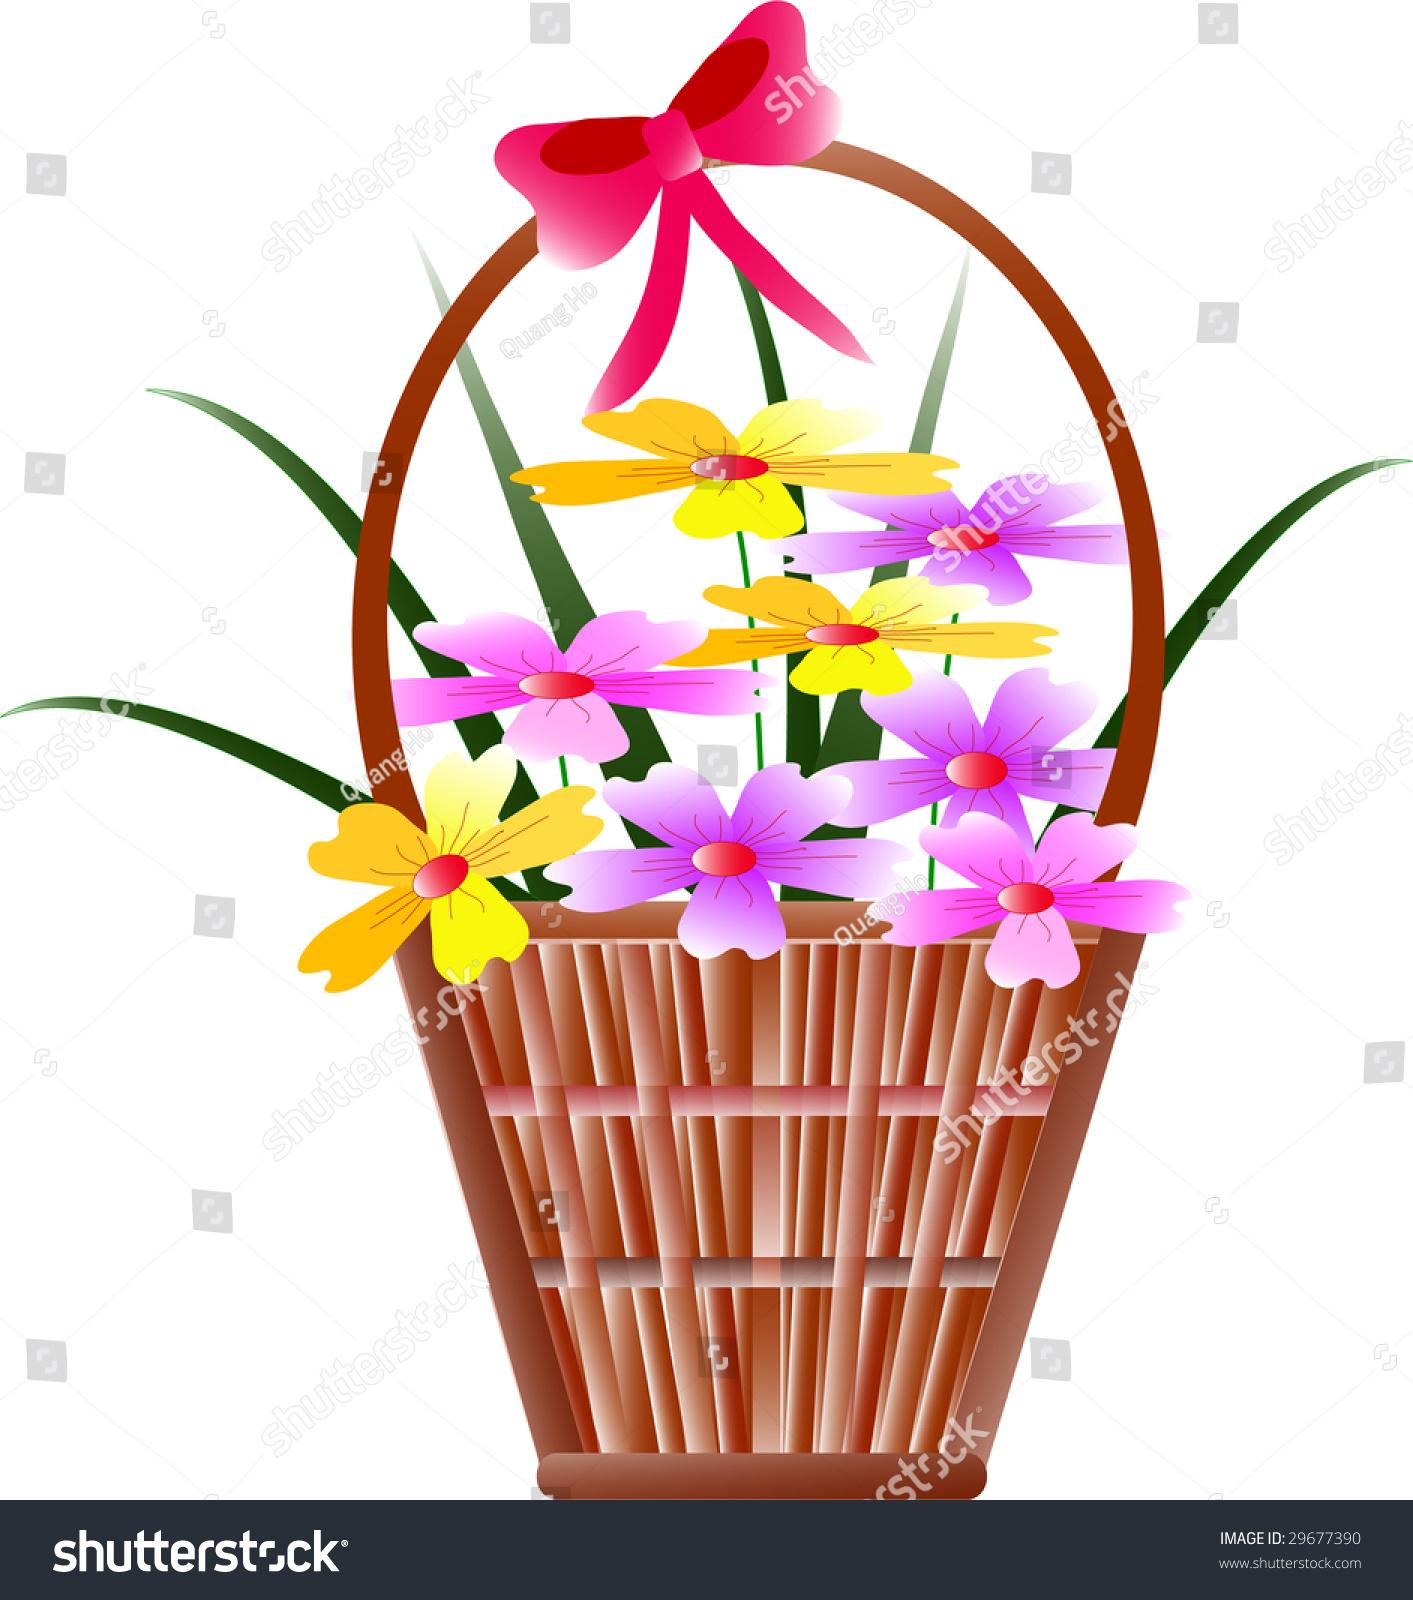 Flower Baskets Vector : A holiday flower basket stock vector illustration